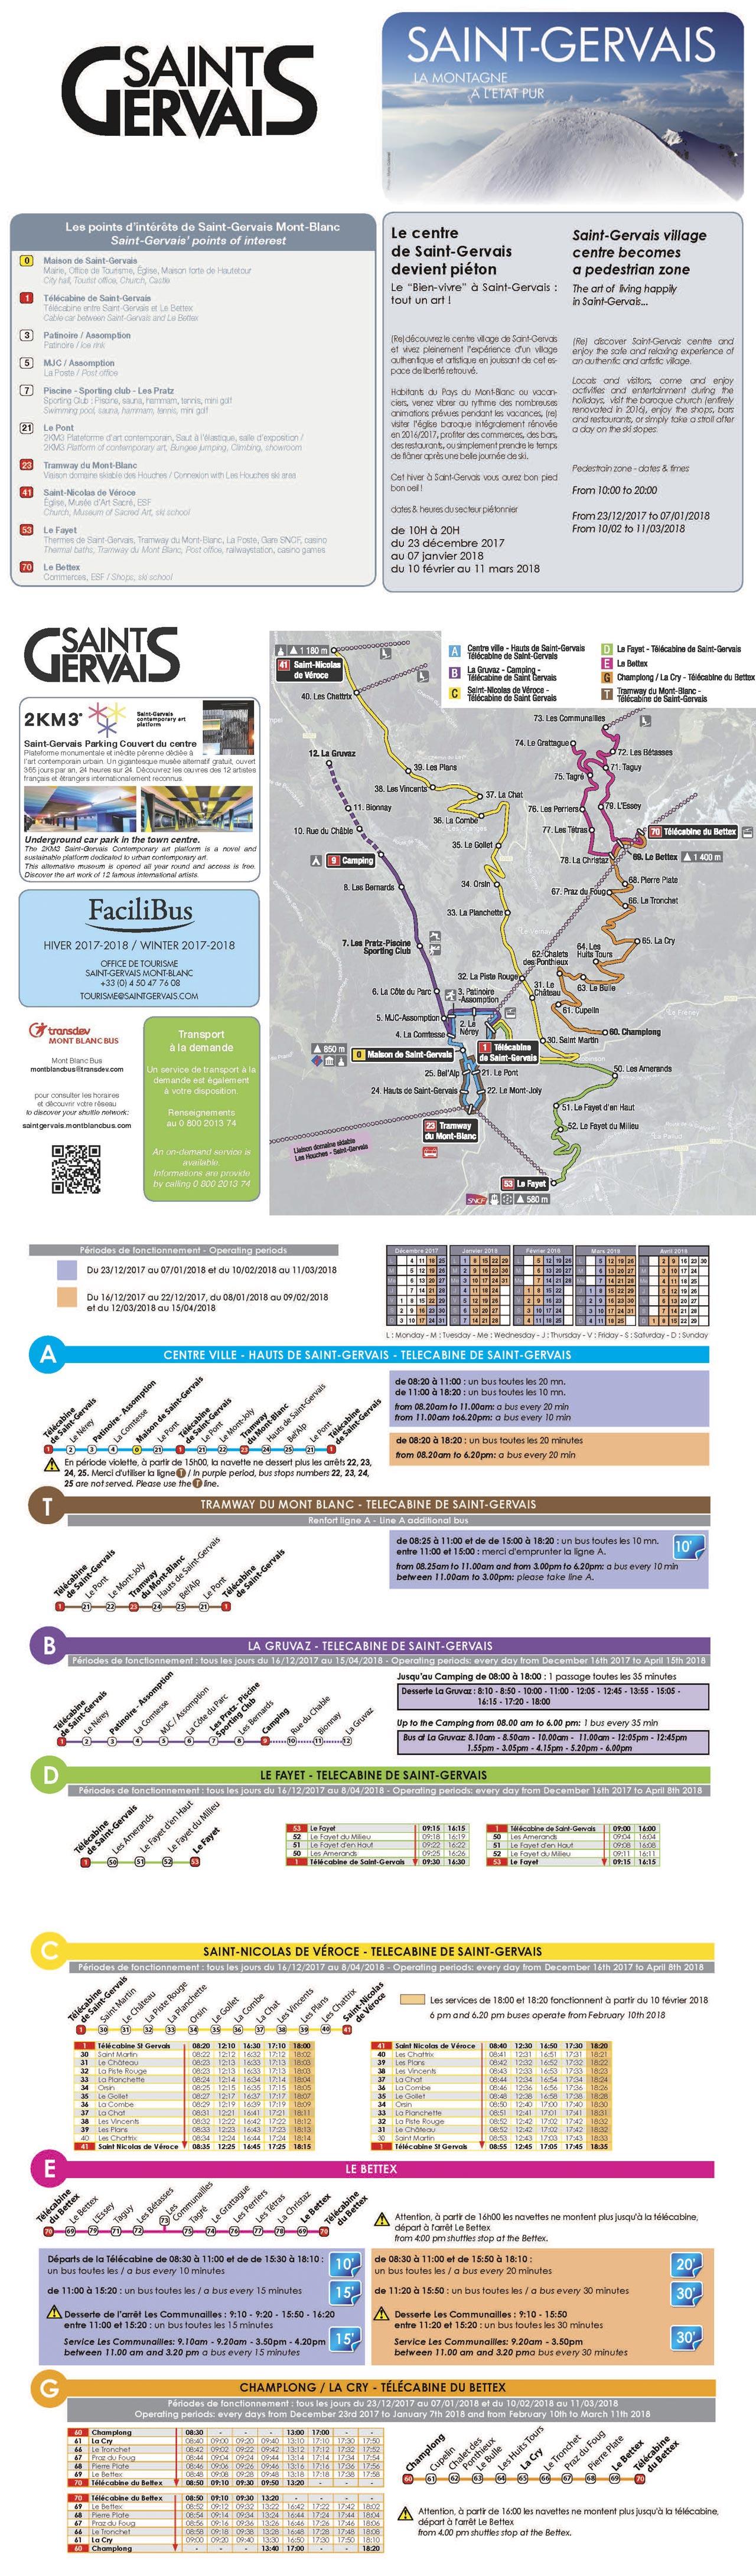 St Gervais Ski Bus Timetables